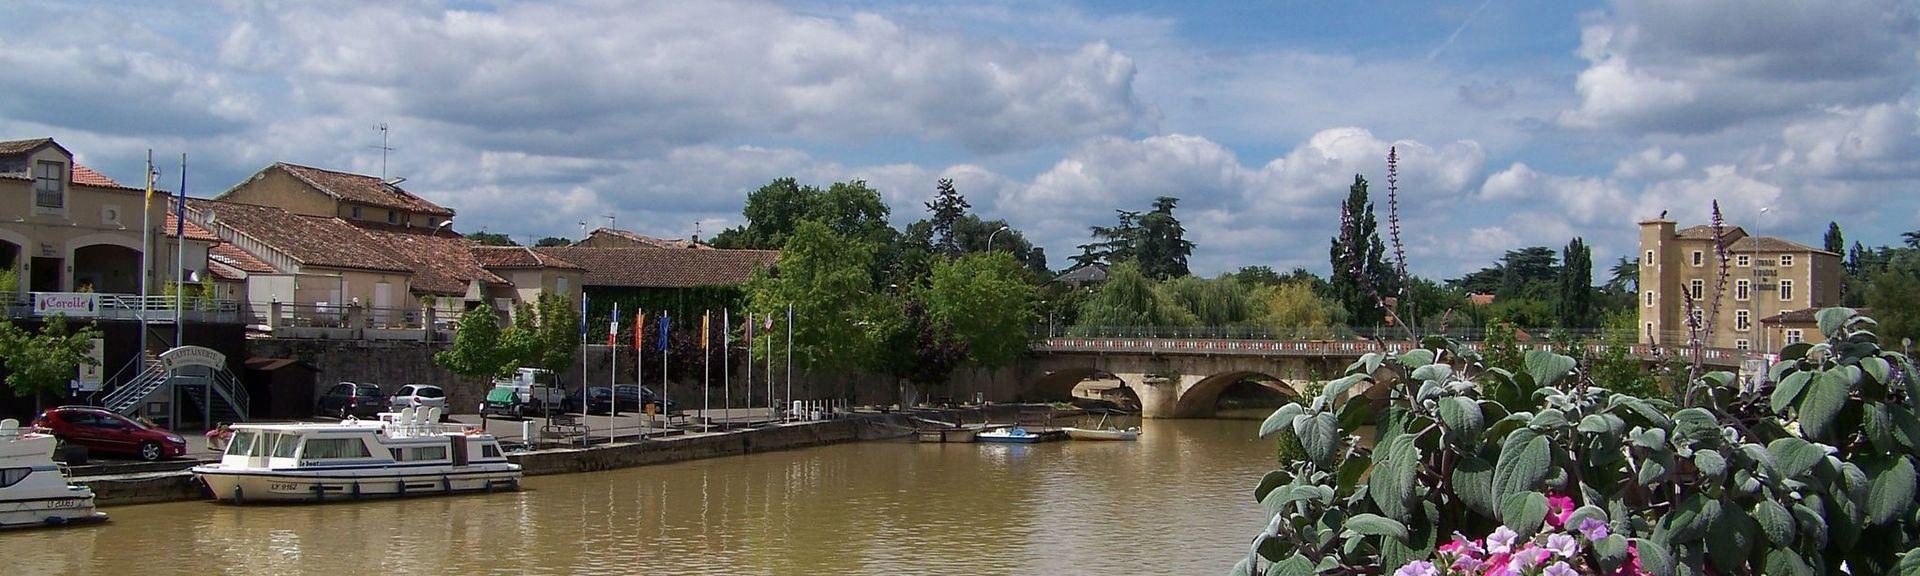 Beauziac, France